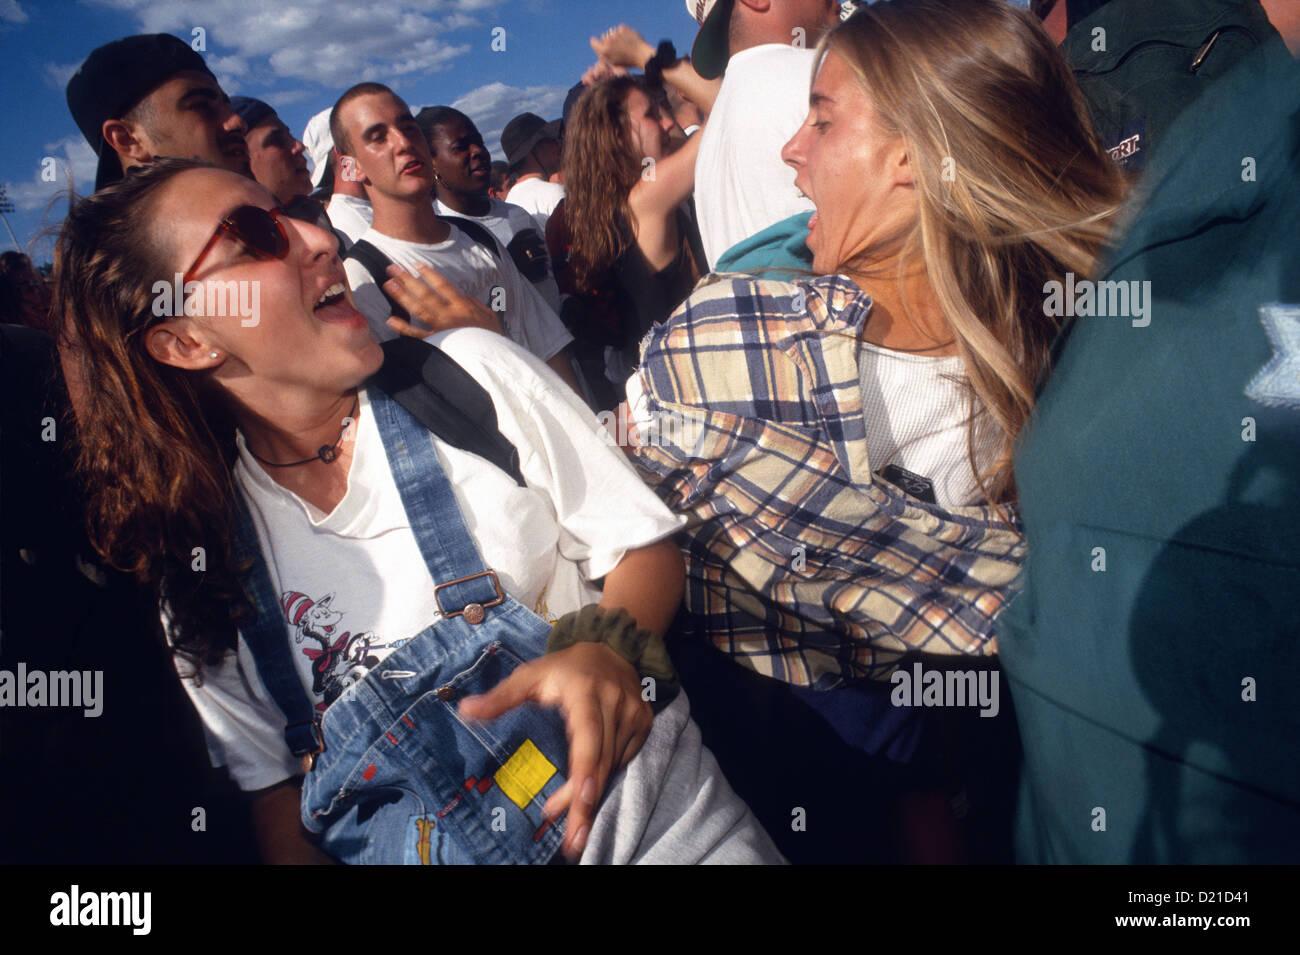 New York, NY - The Mosh Pit at Lollapalooza - Stock Image